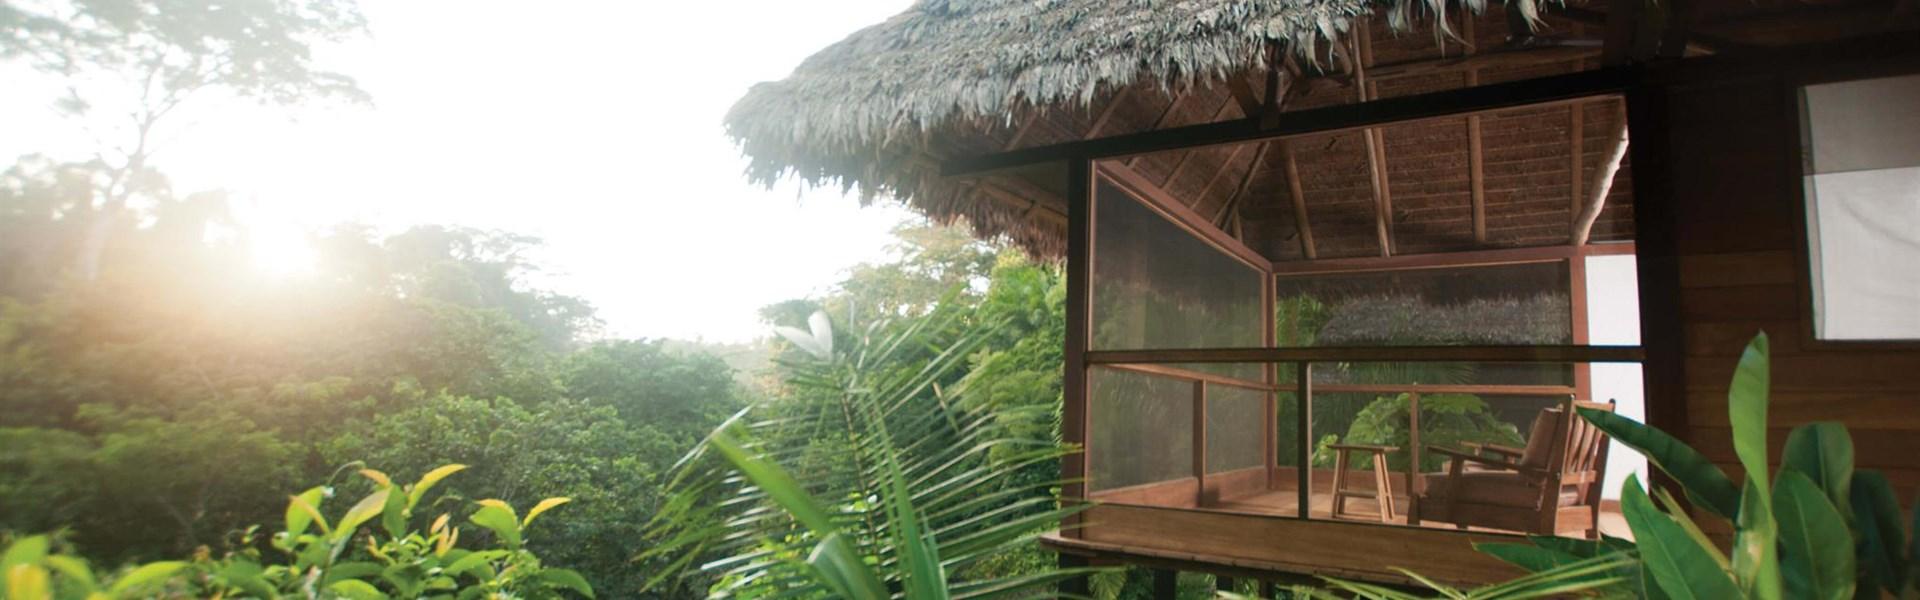 Balíček: Amazonie - Inkaterra Concepción -